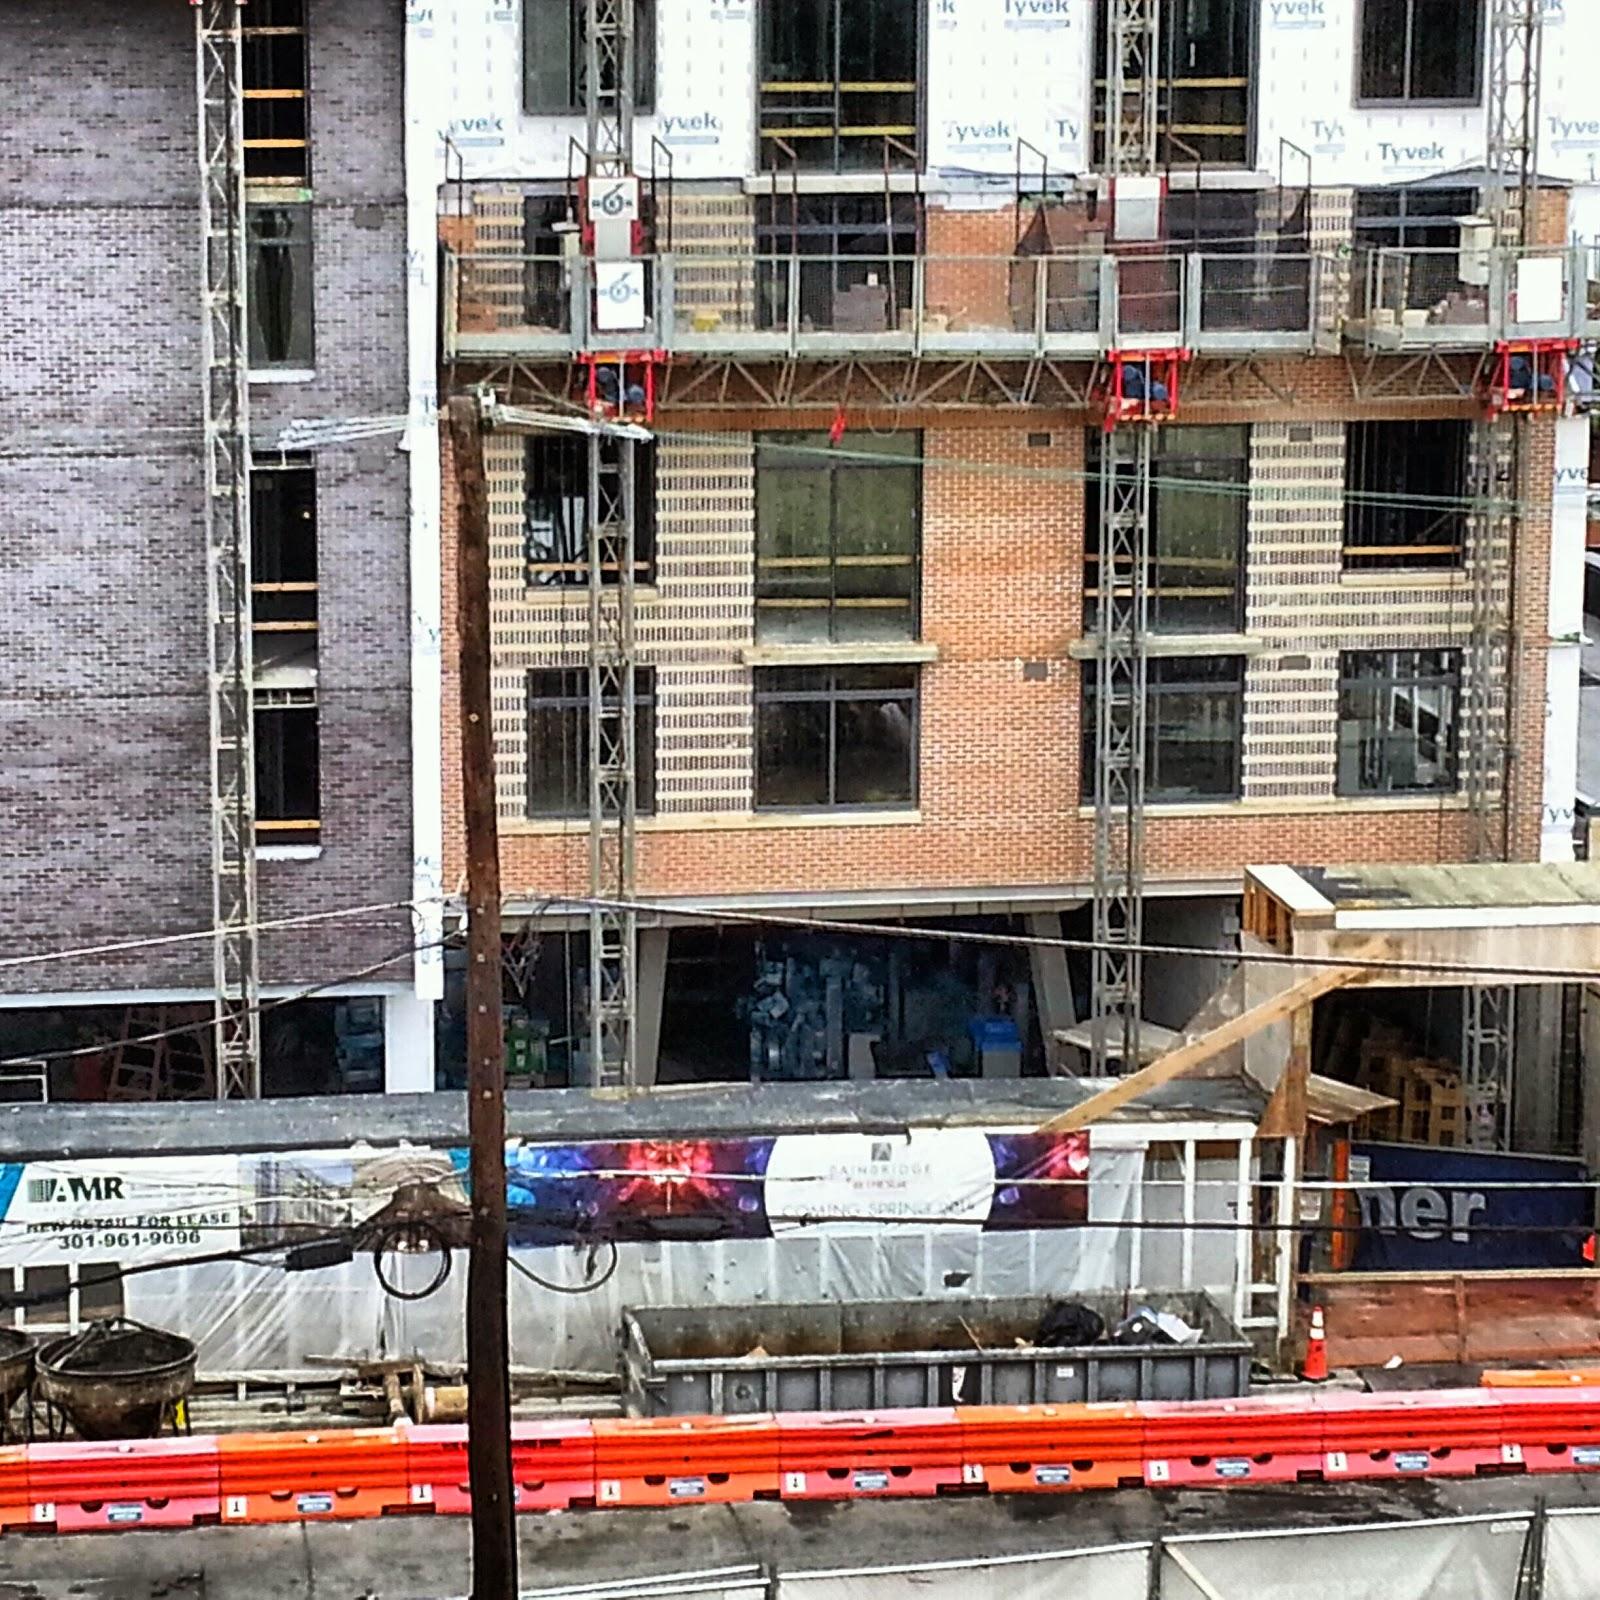 Apartments In Bethesda: Robert Dyer @ Bethesda Row: BAINBRIDGE BETHESDA LUXURY